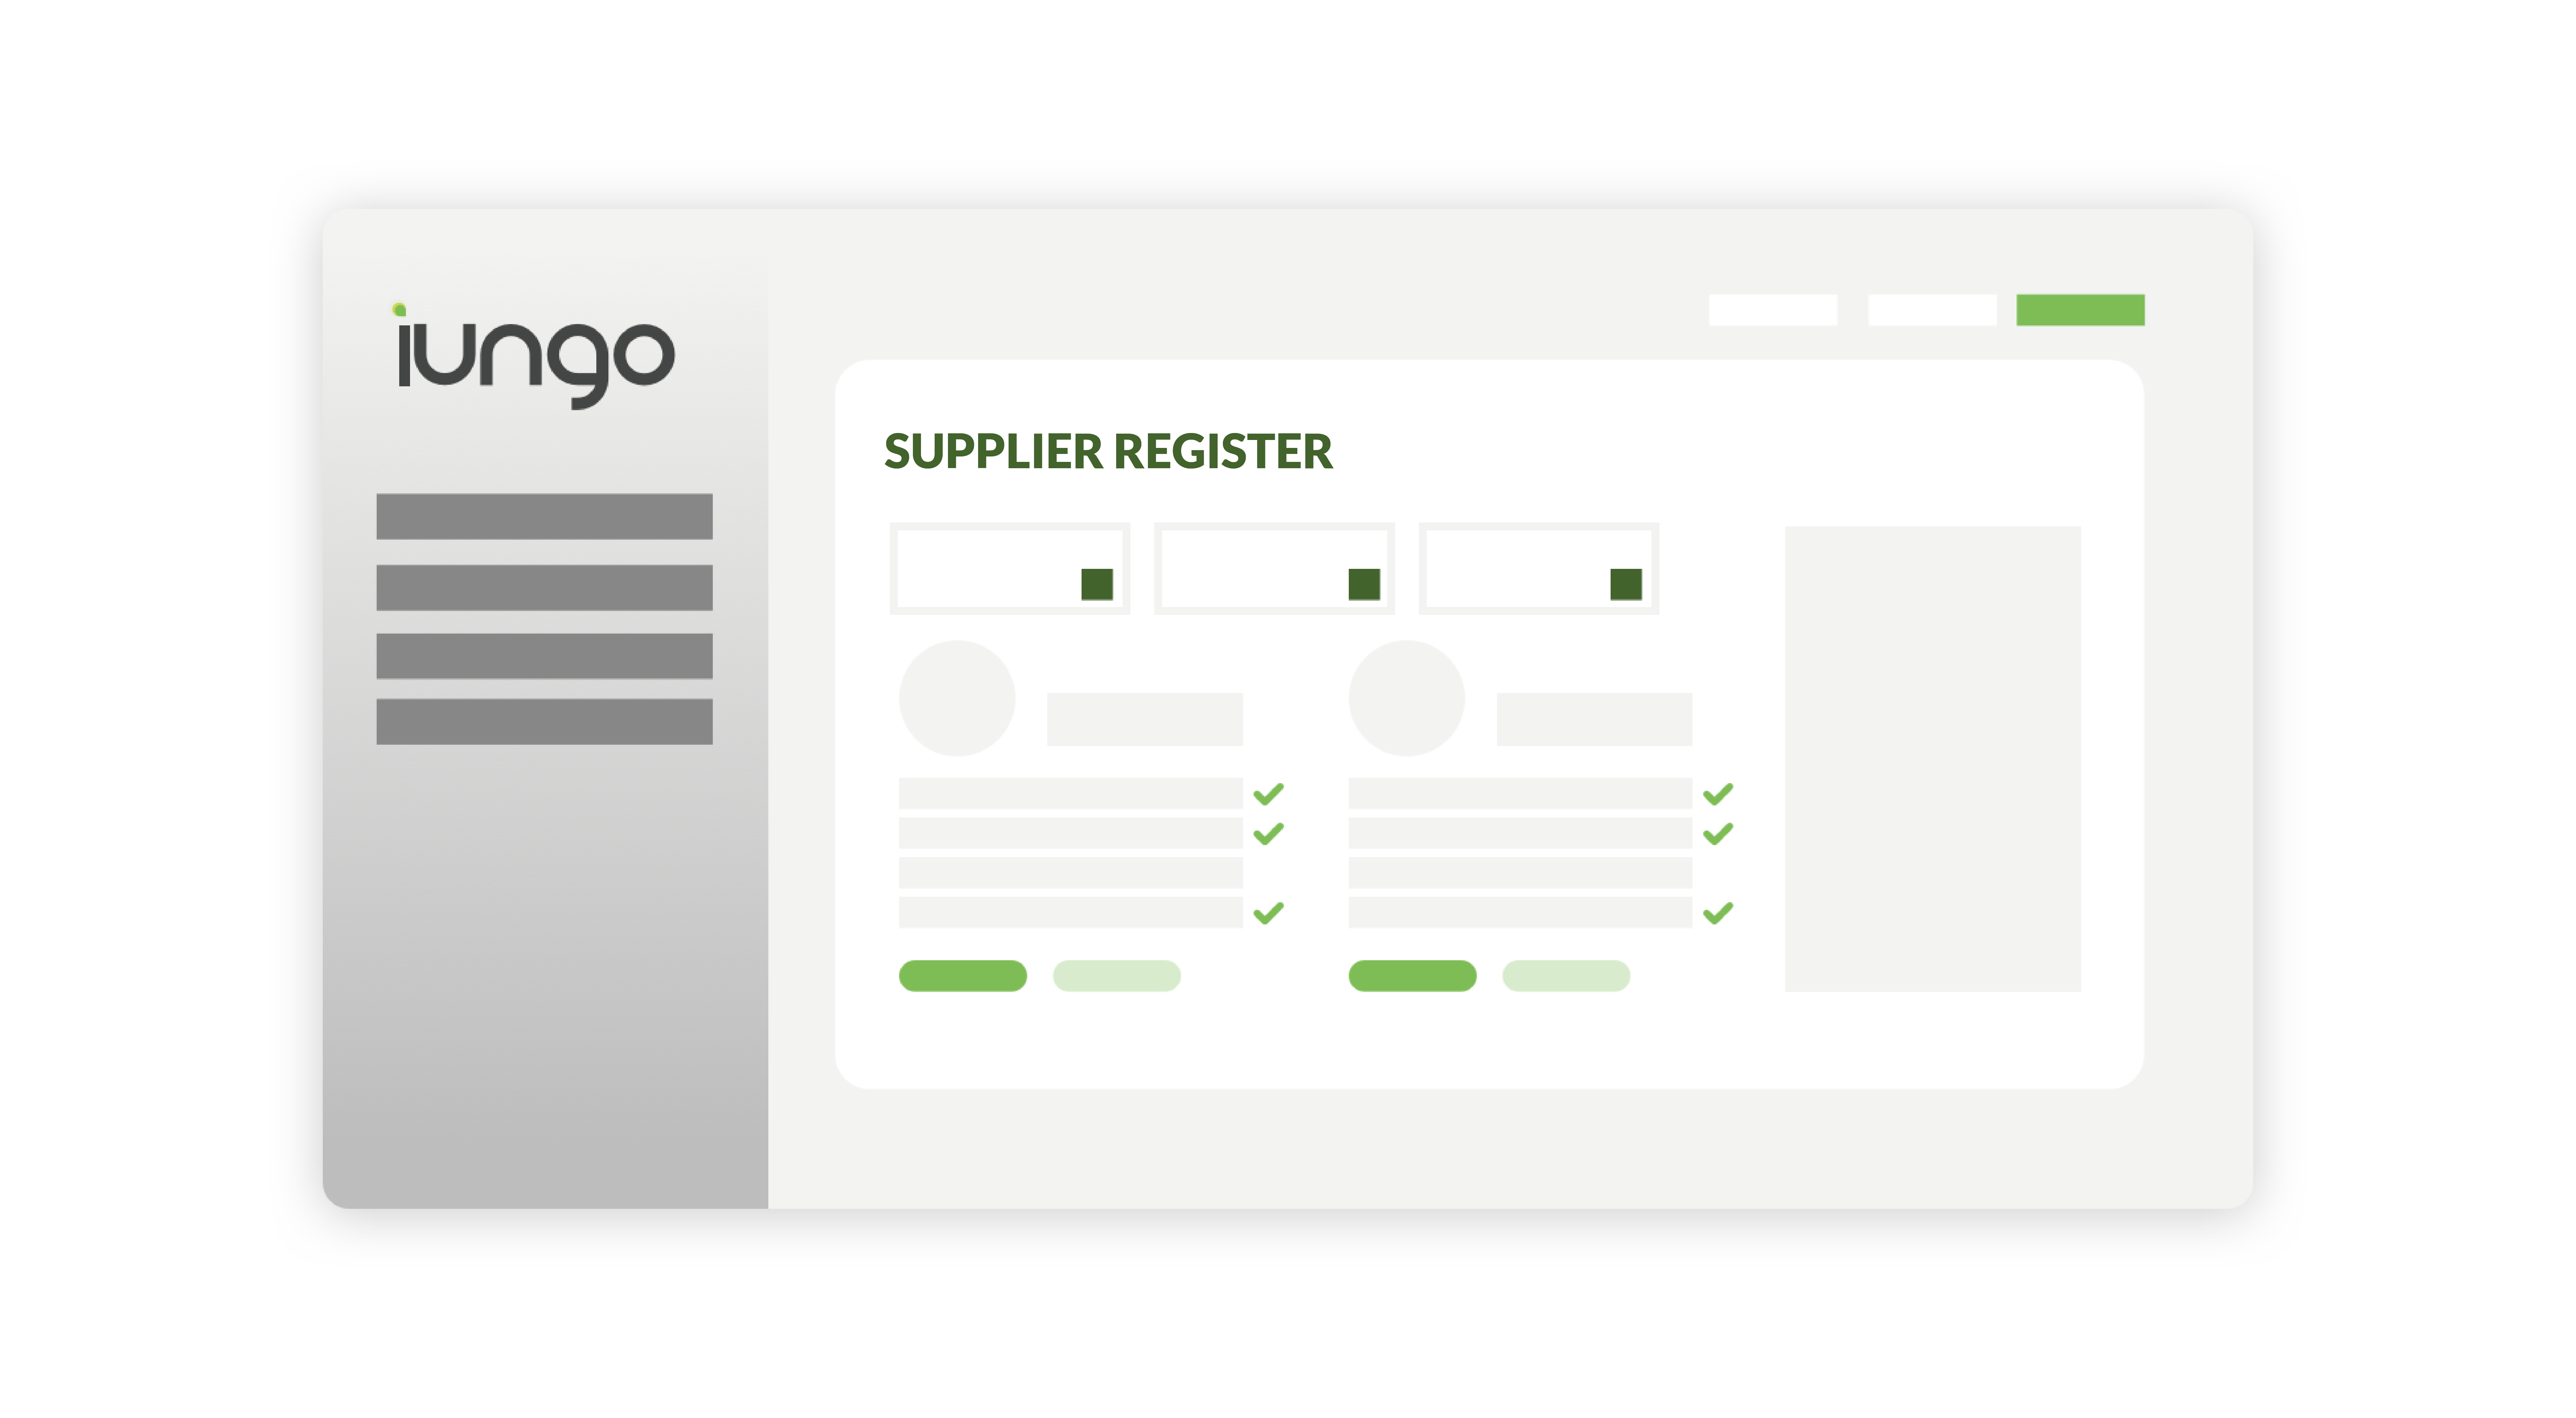 supplier register